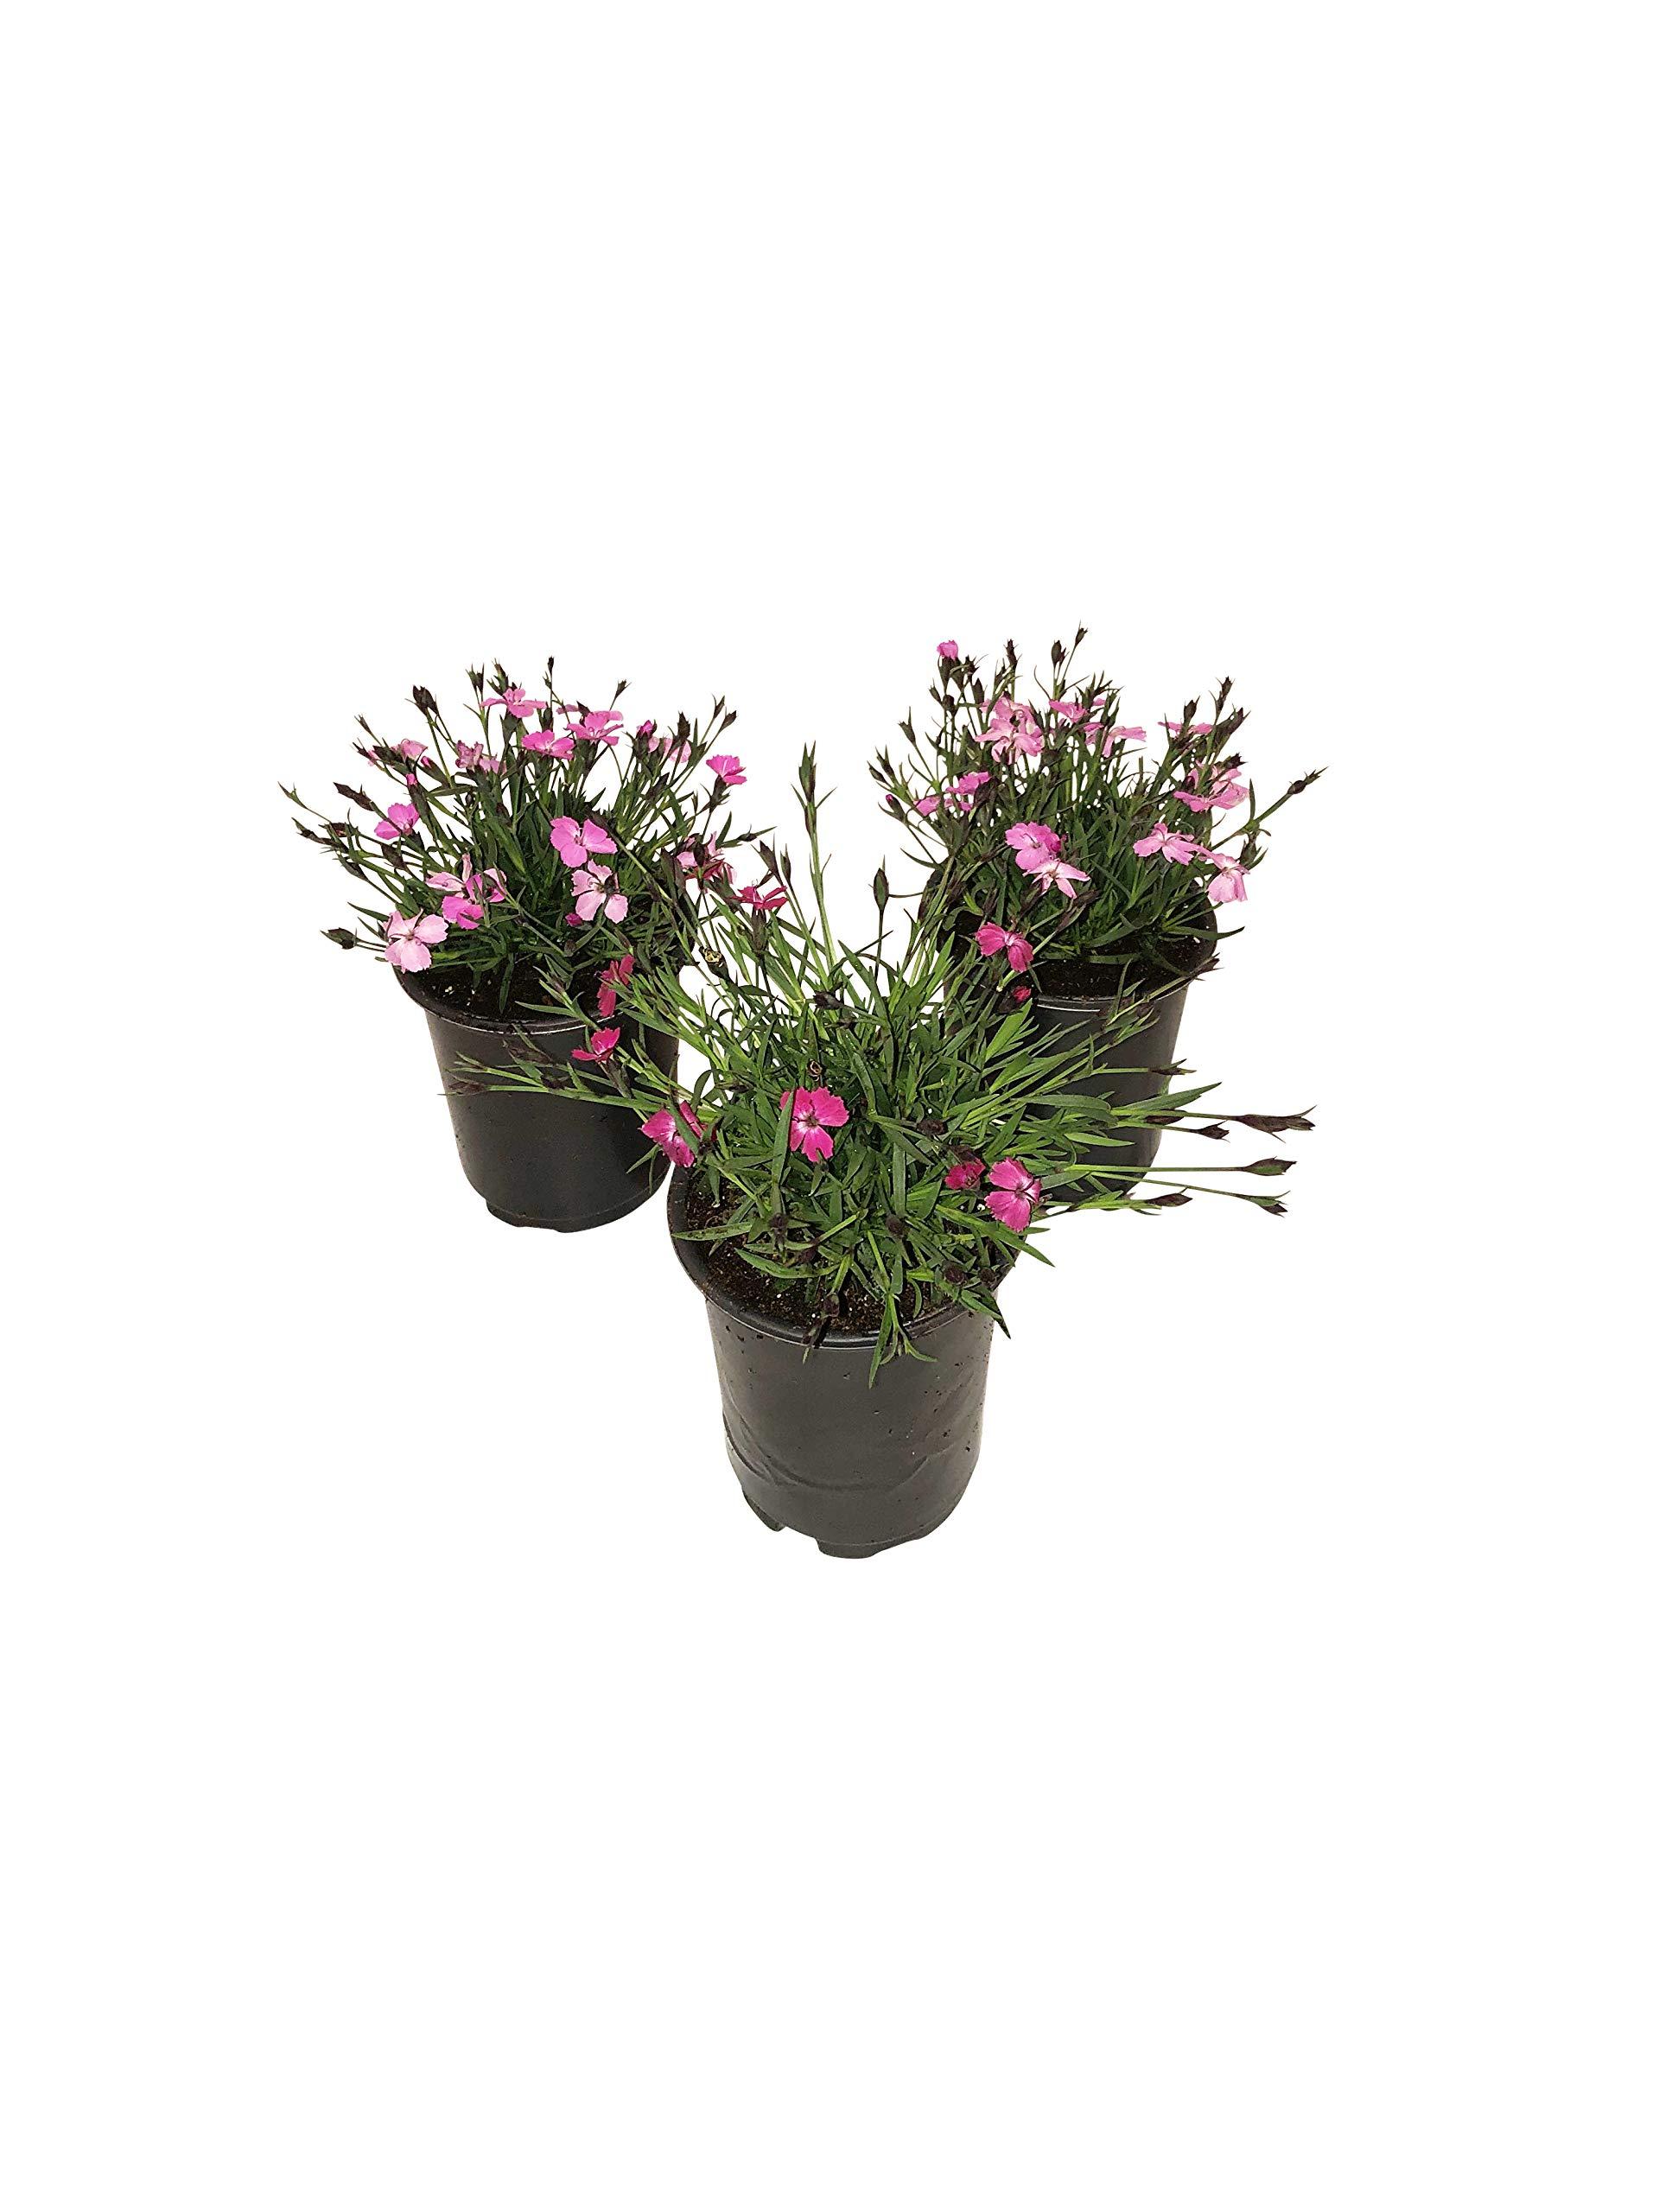 The Three Company Live 5'' Perennial ((Dianthus), 1 Quart Pot, Shades of Pink